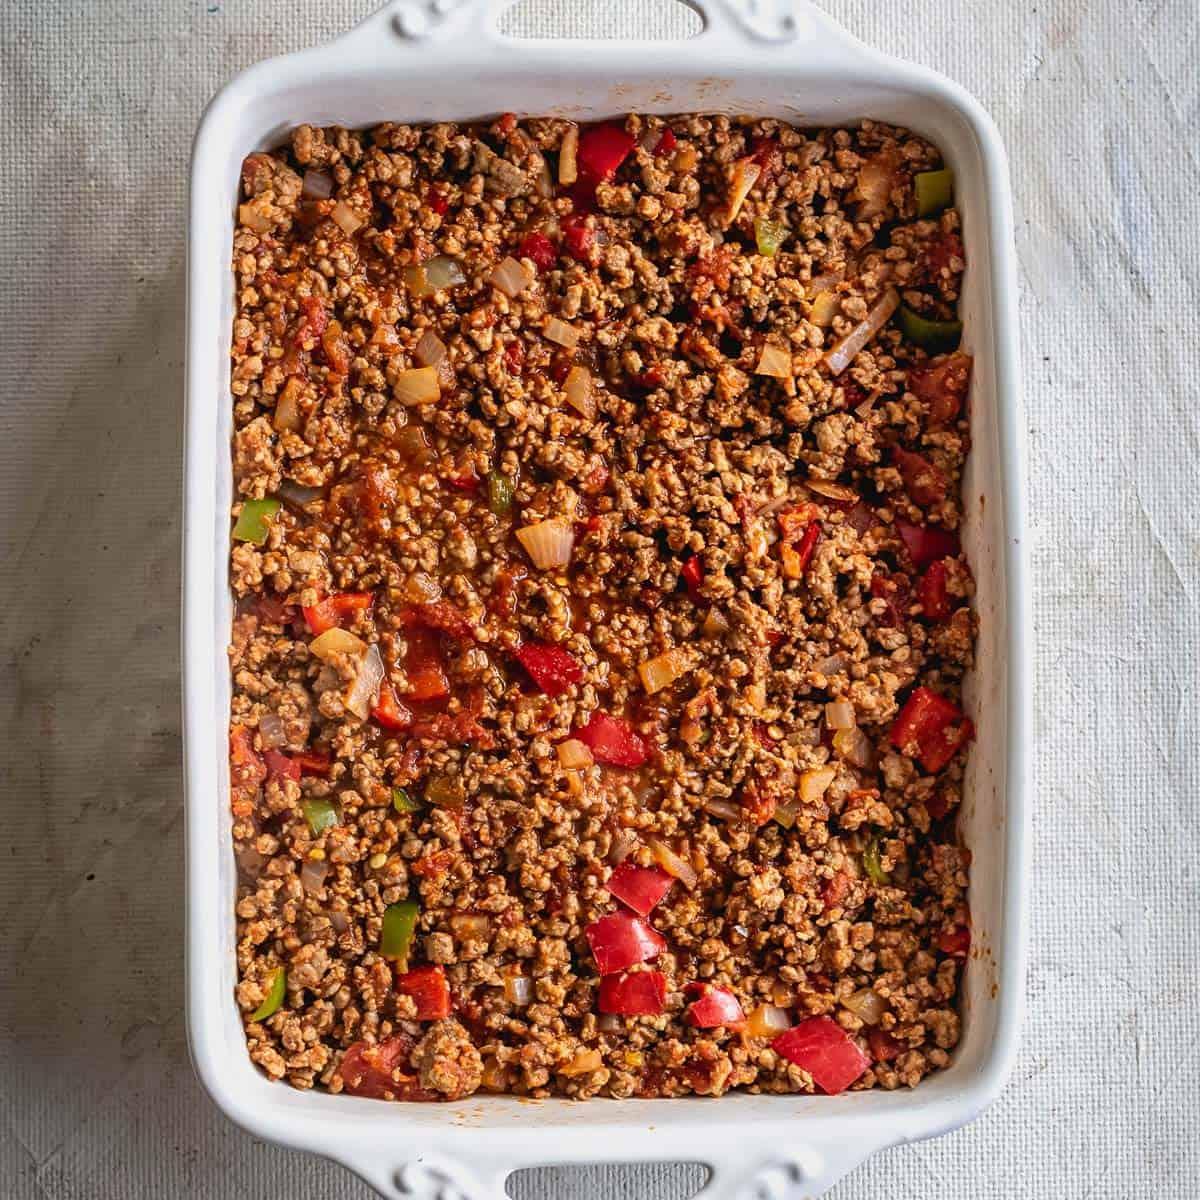 Ground beef spread in baking dish